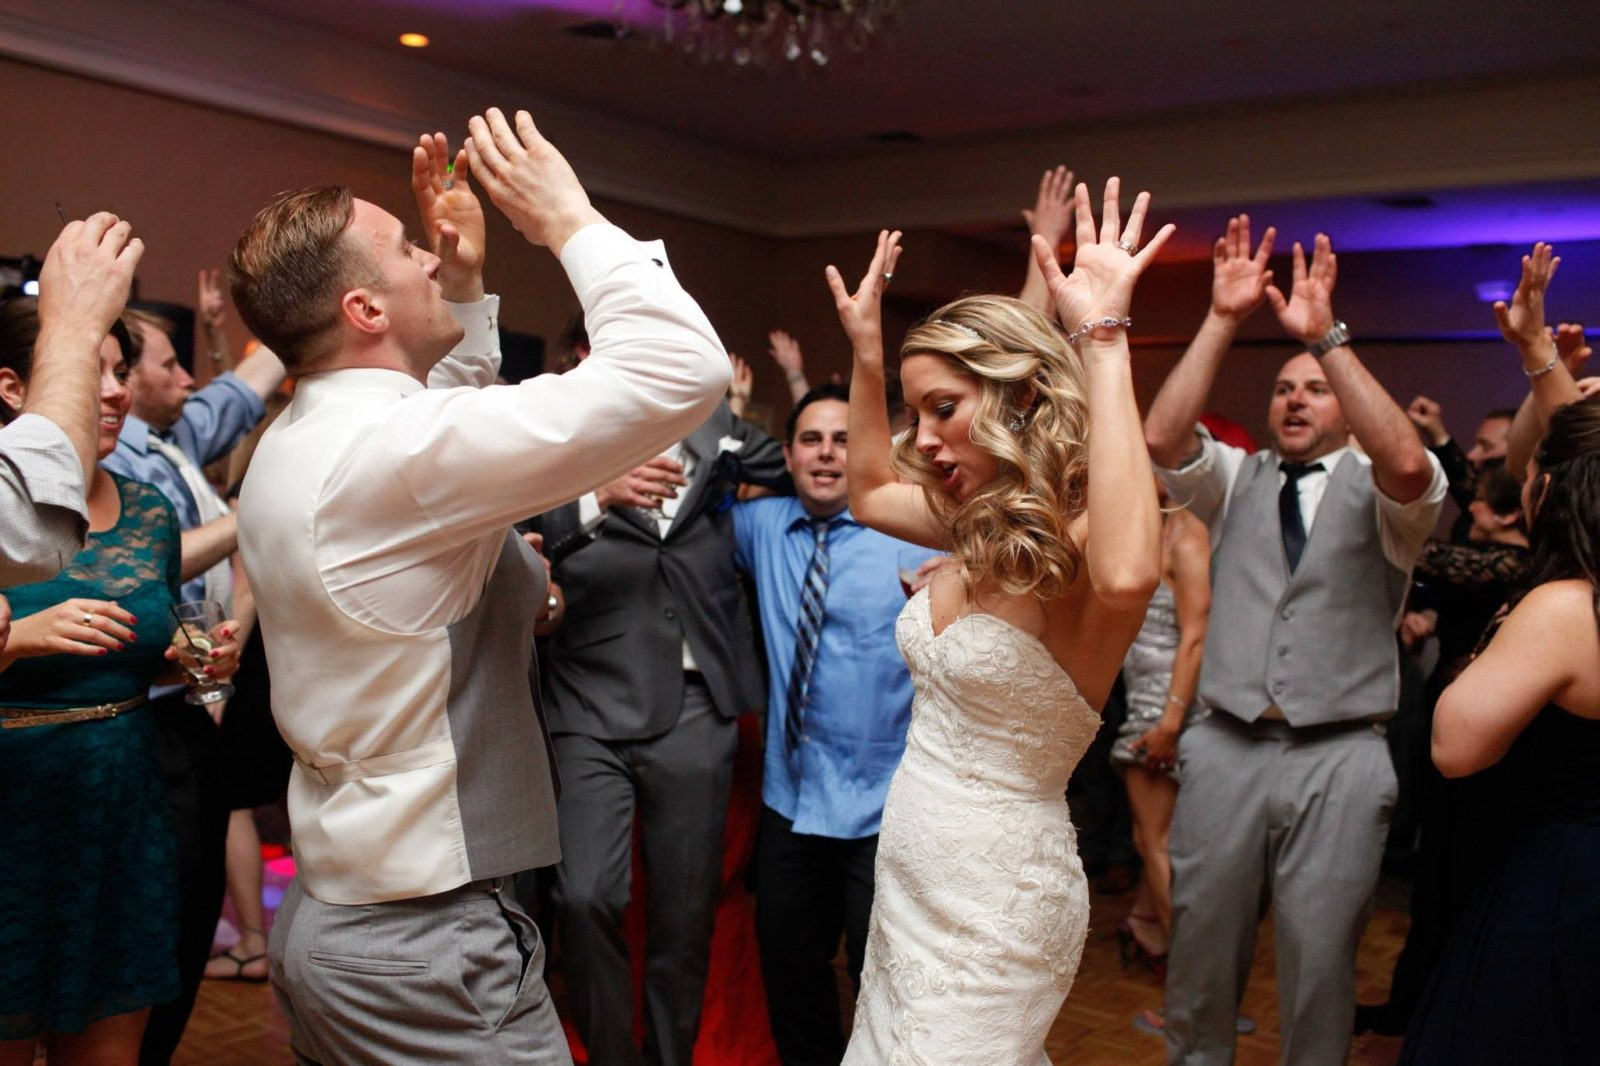 wedding-dj-services-nj